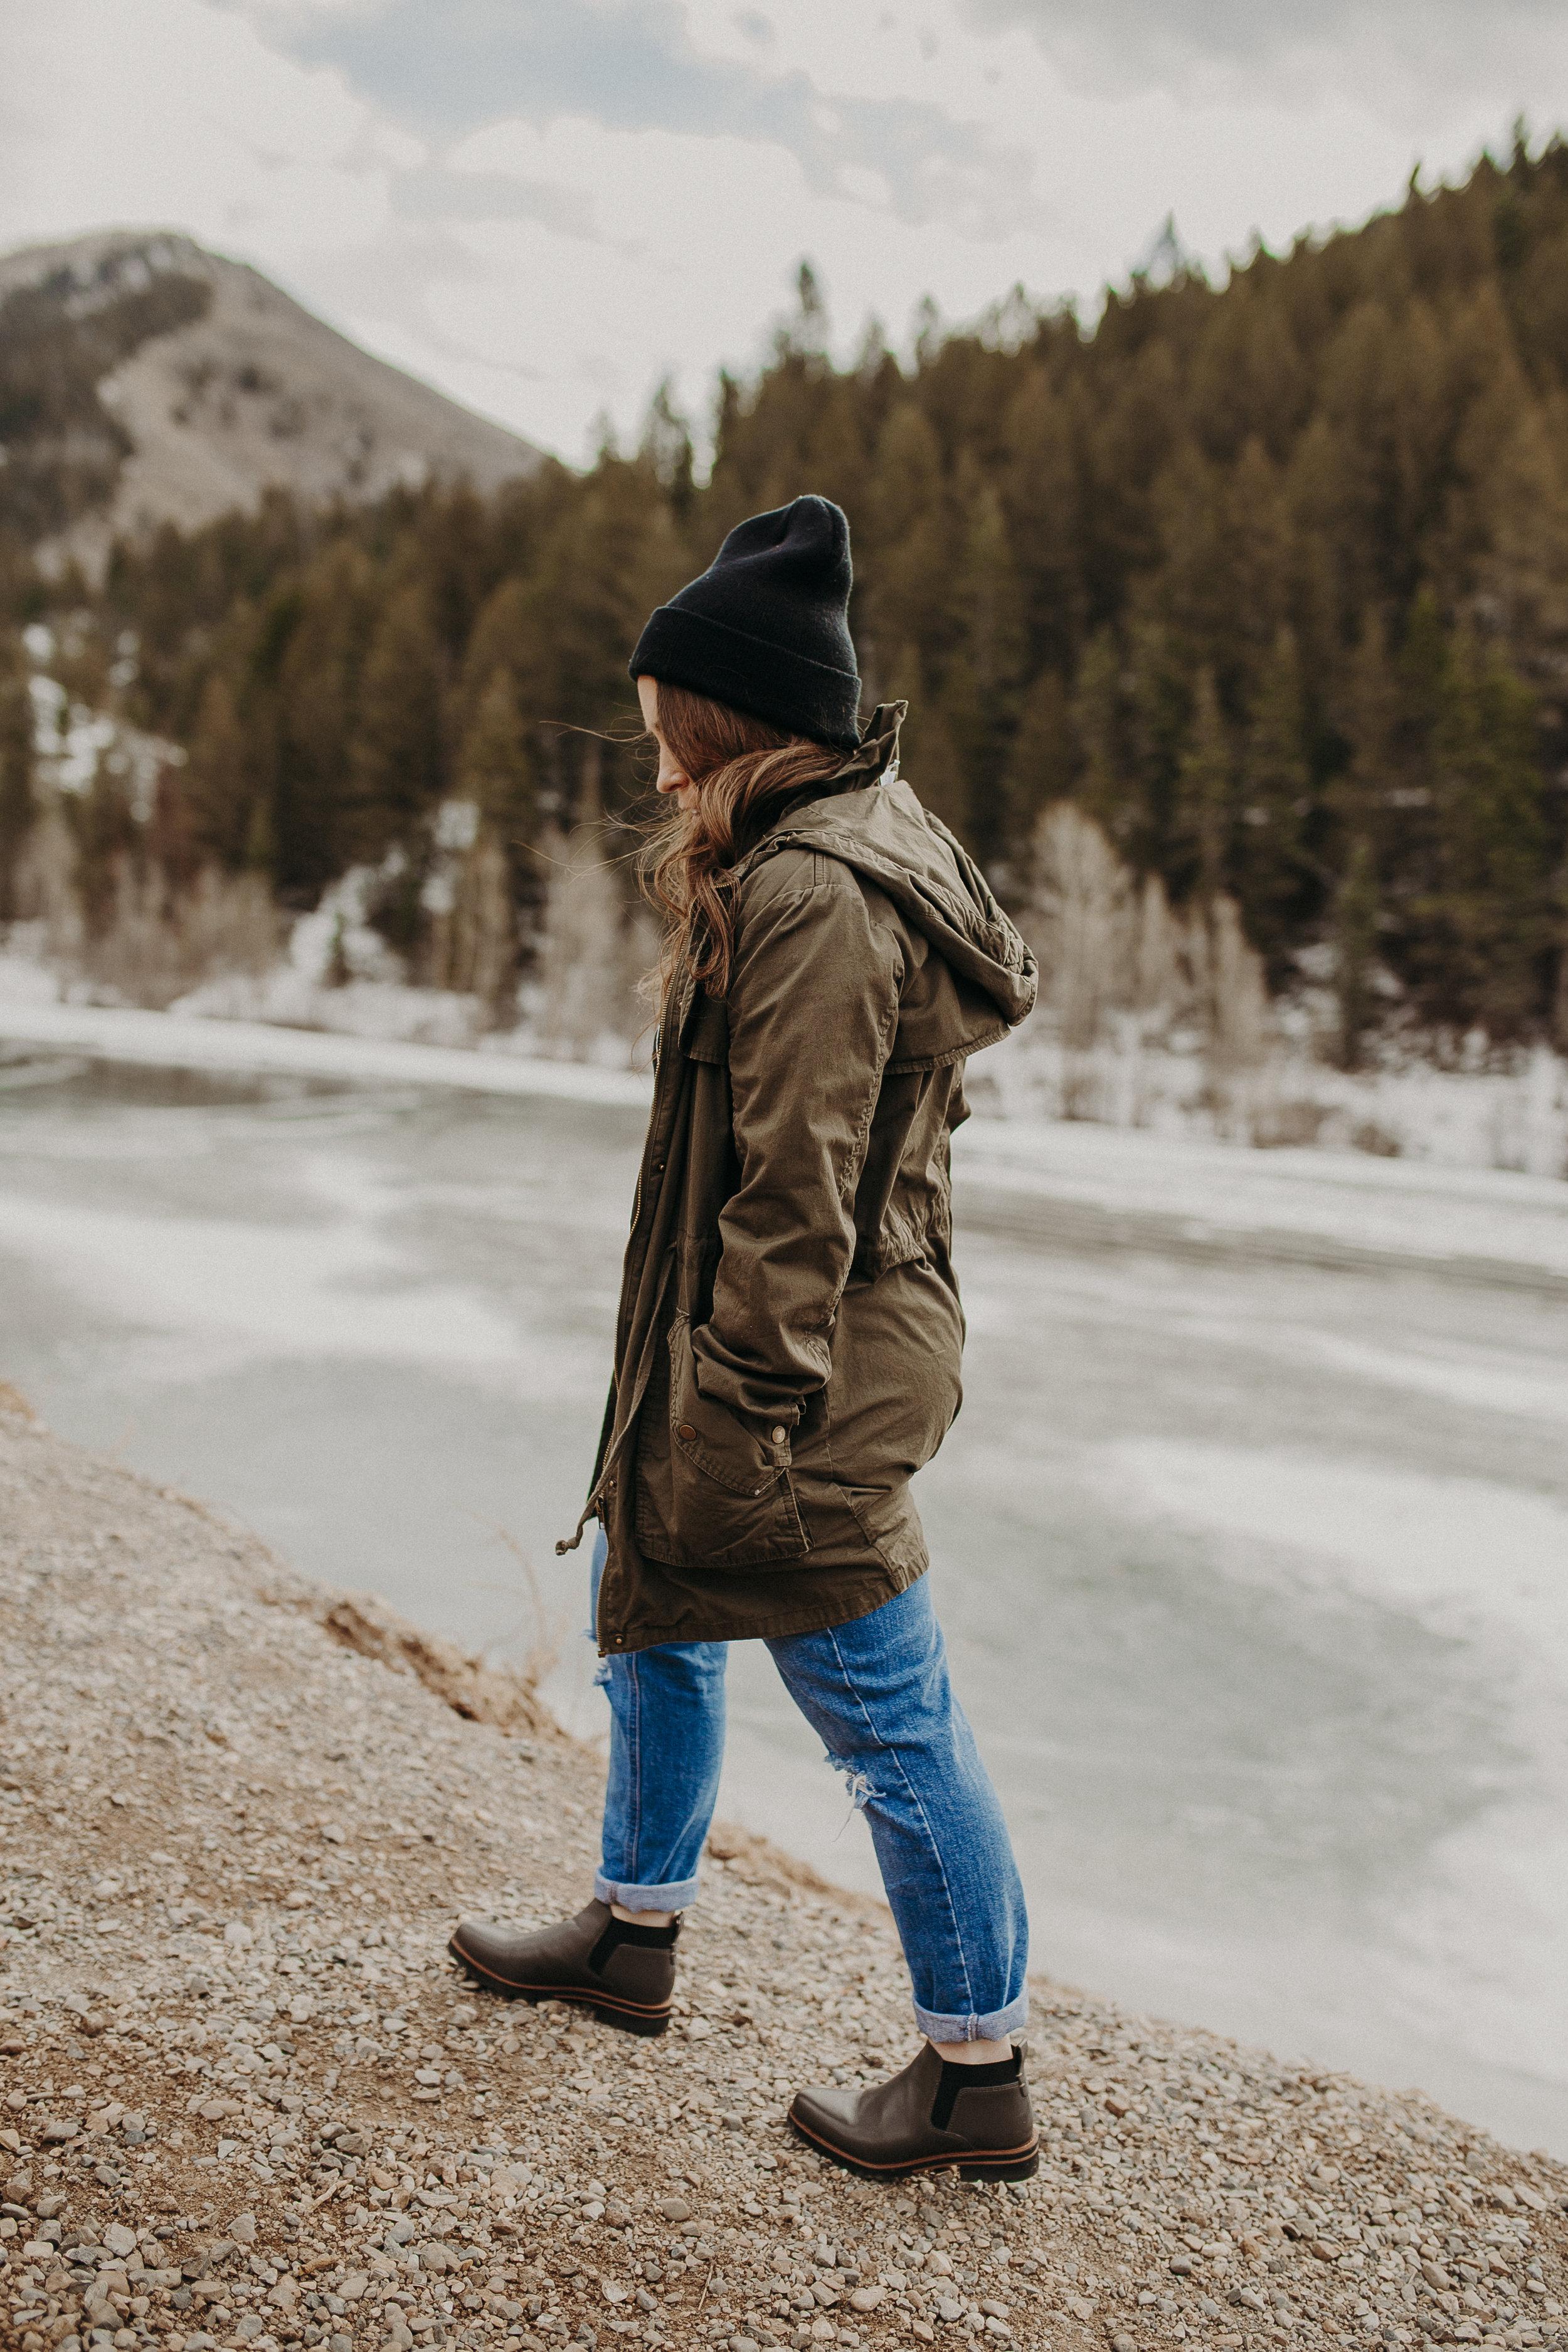 stylish-adventure-gear-and-clothing-companies-20.jpg